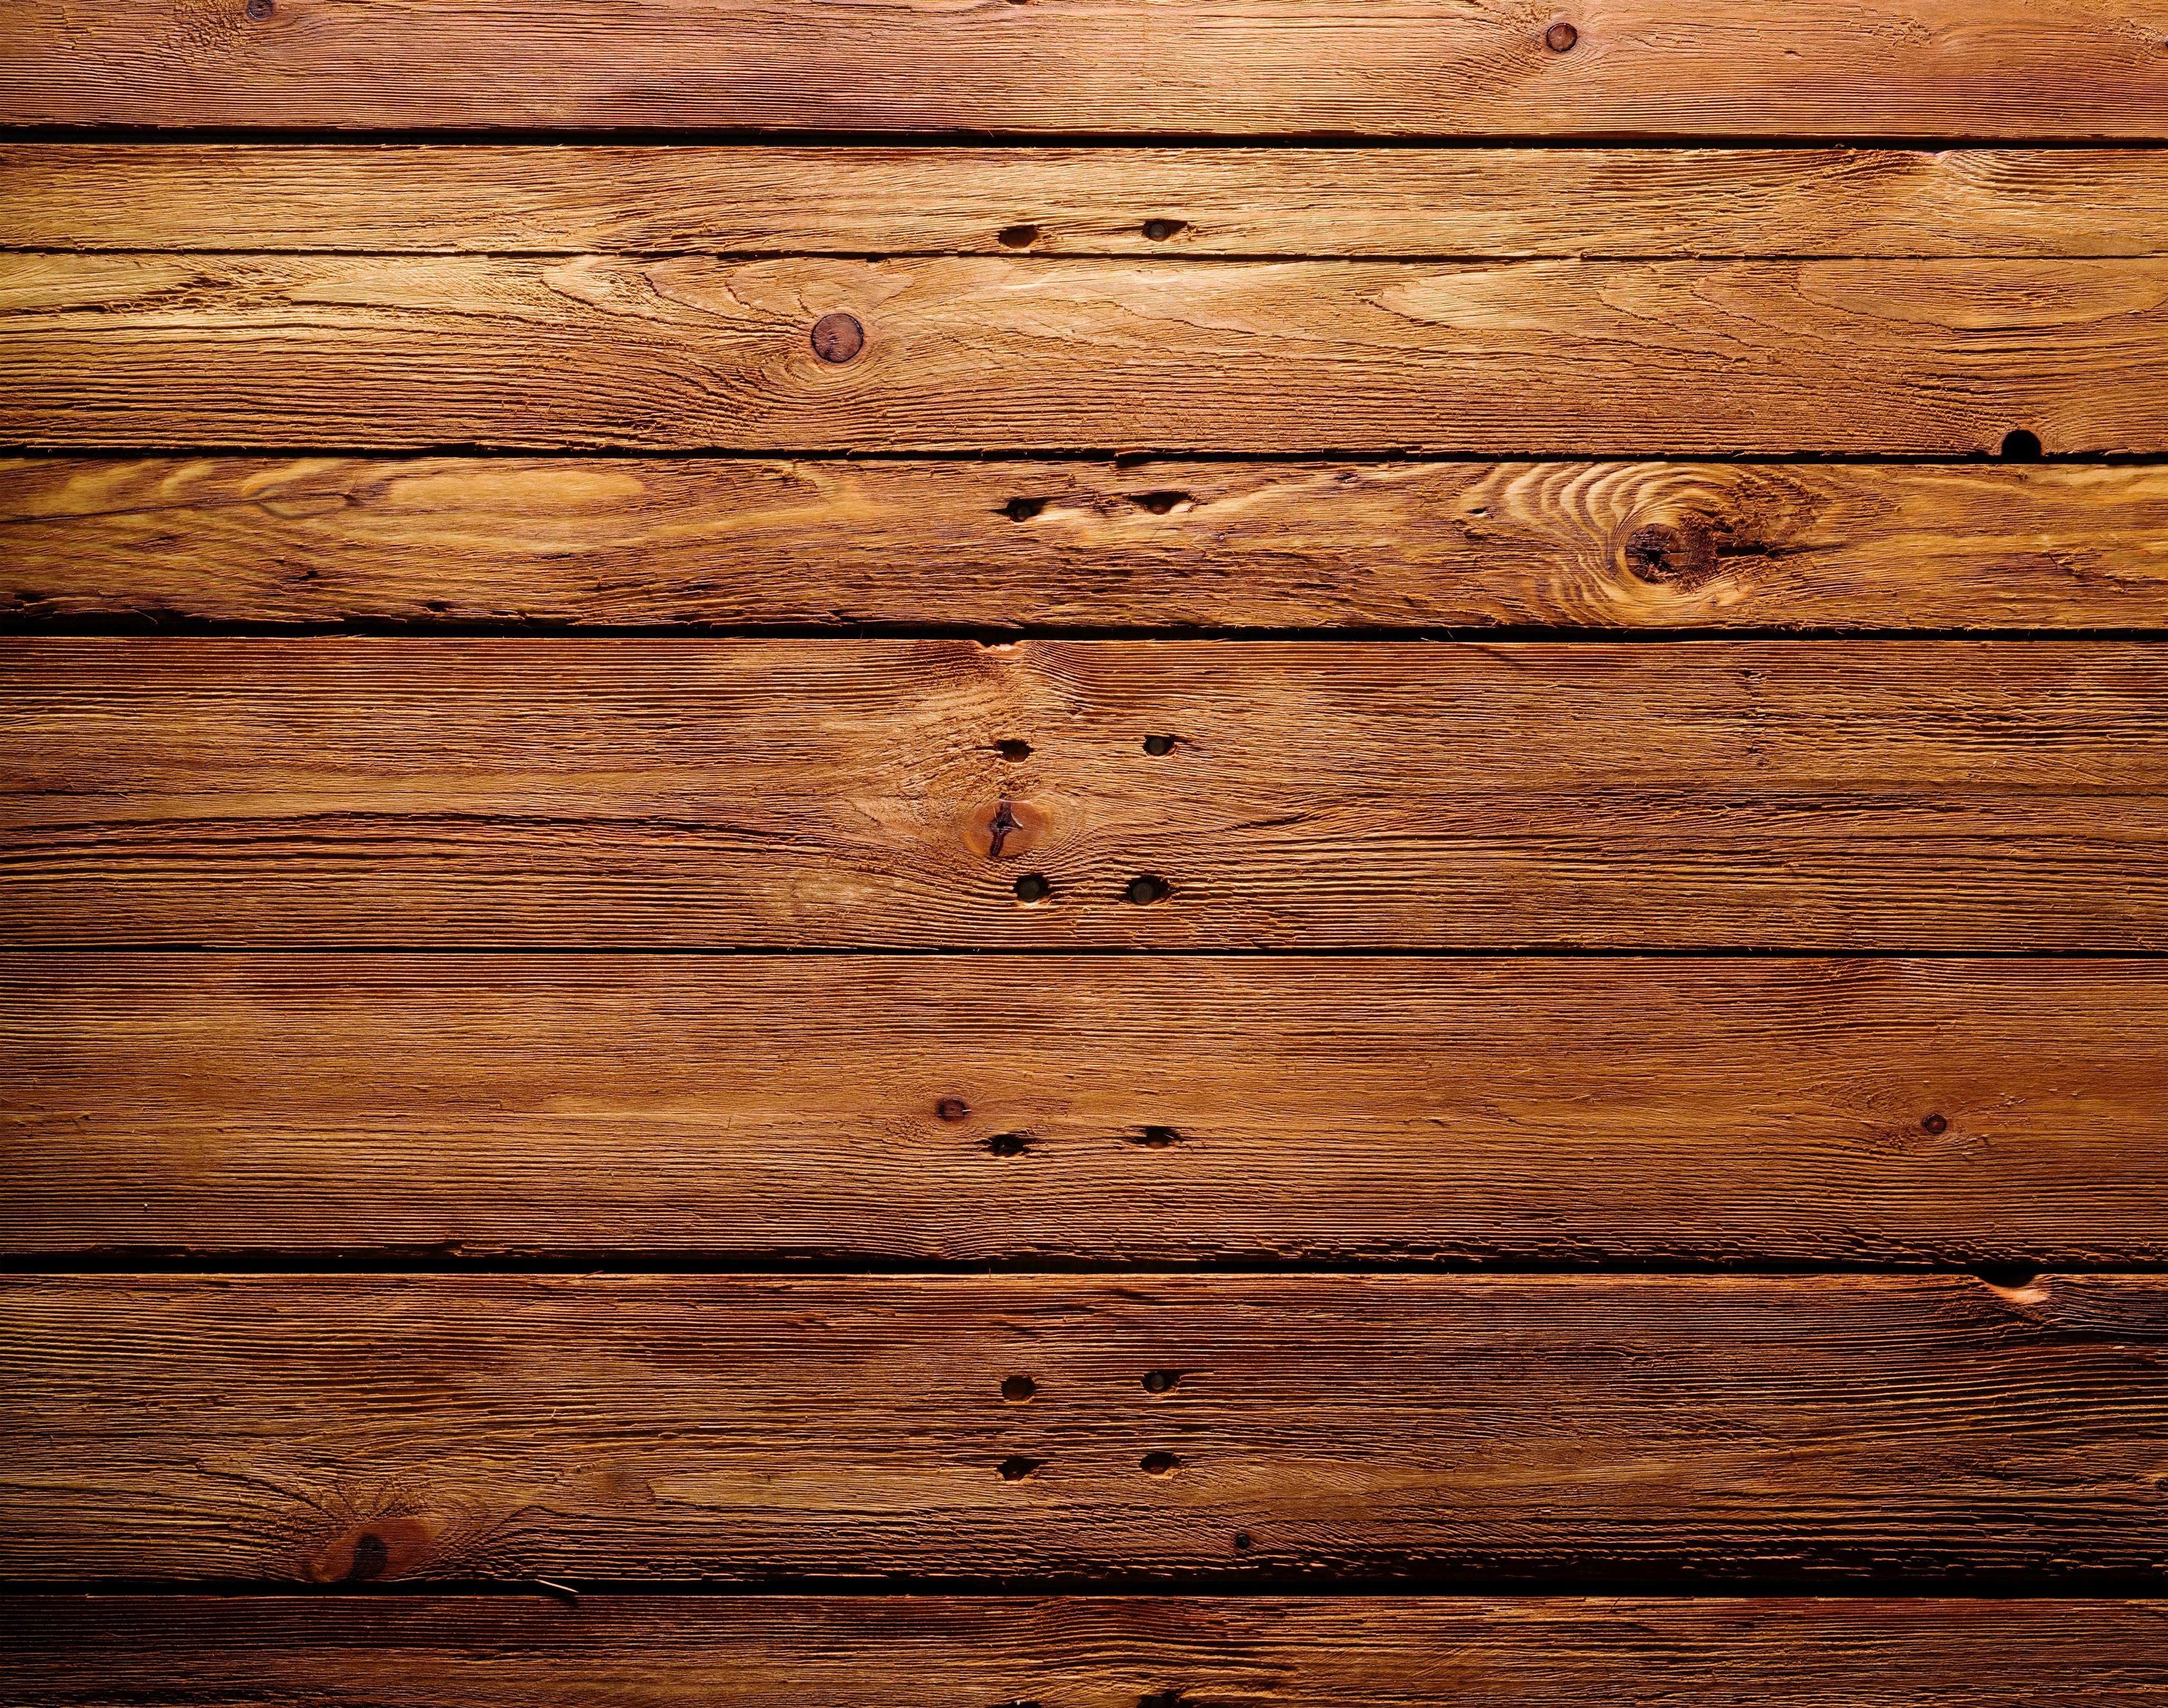 wood, Timber, Closeup, Wooden Surface, Texture Wallpapers HD ...